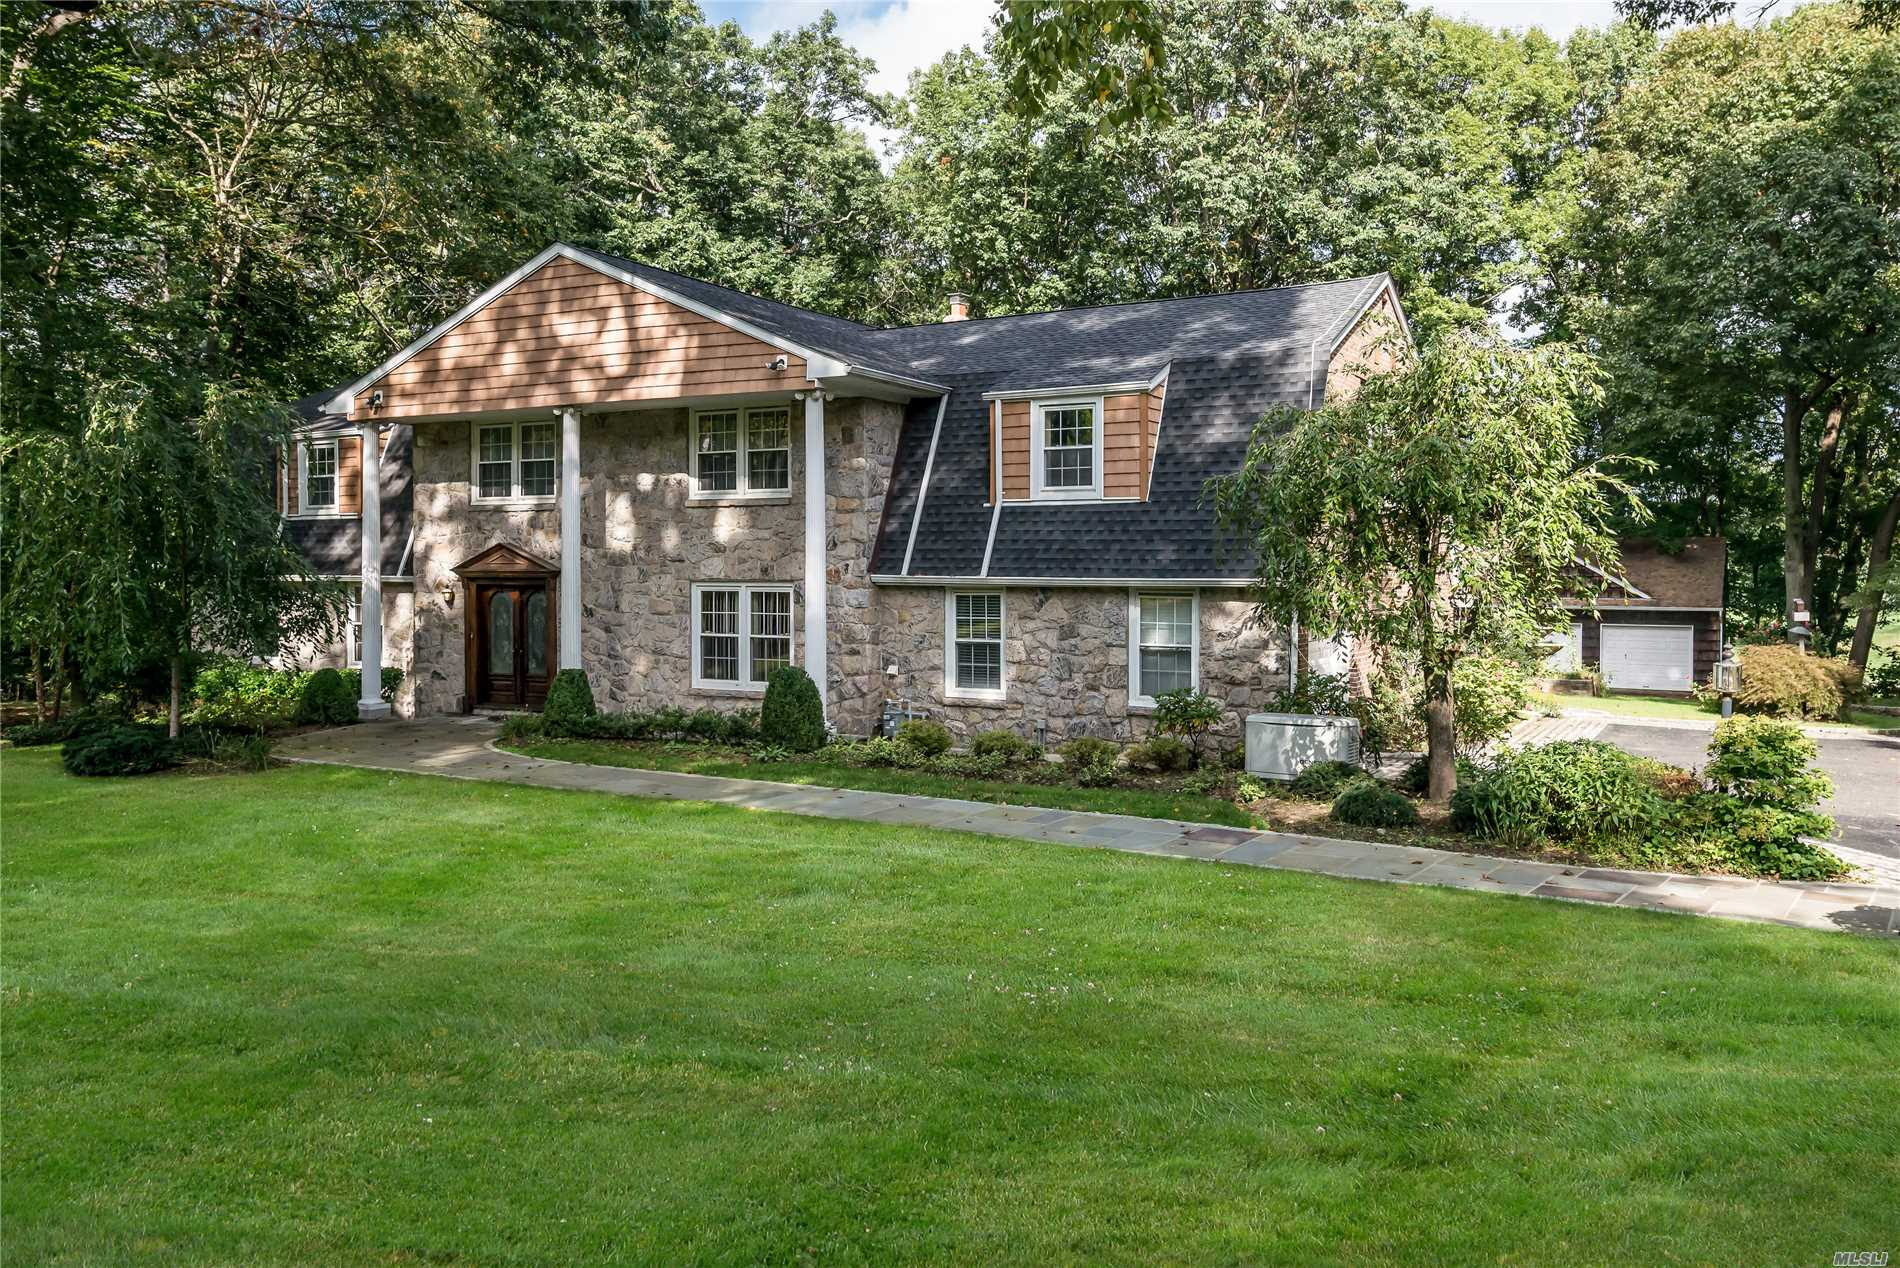 Photo of home for sale at 1 Sierks Lane, Roslyn Harbor NY